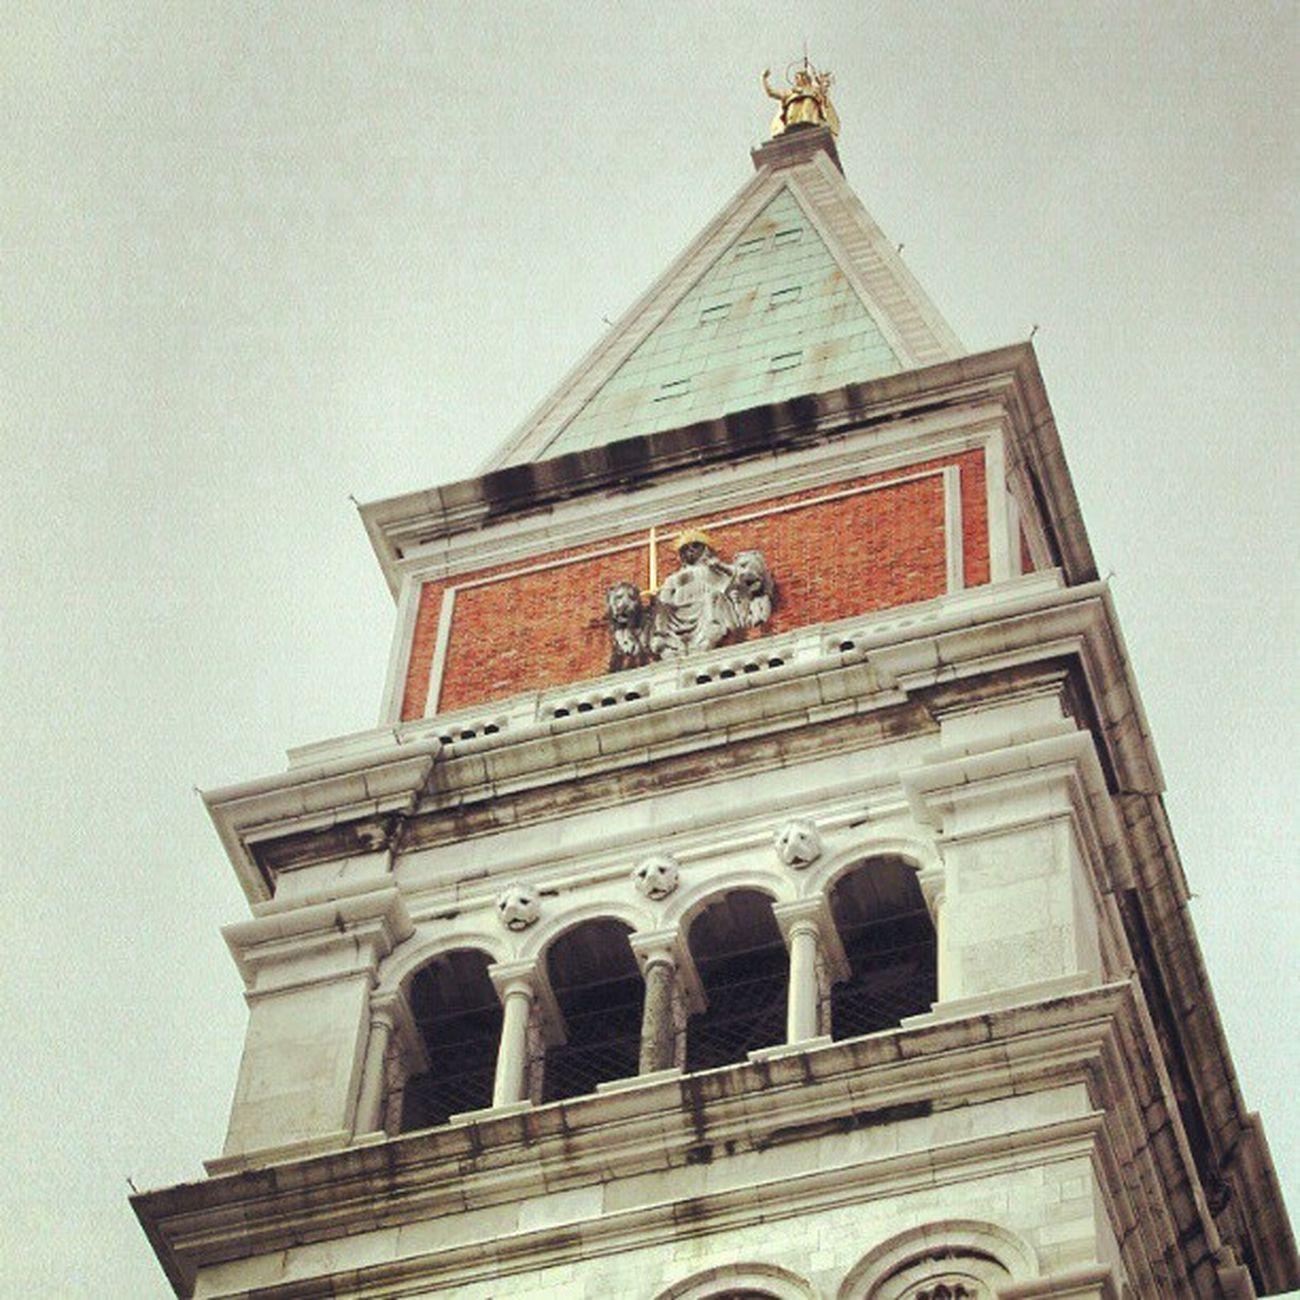 #venice #church #tower #igers #igfamos #instagood Church Venice Tower Igers Instagood Igfamos